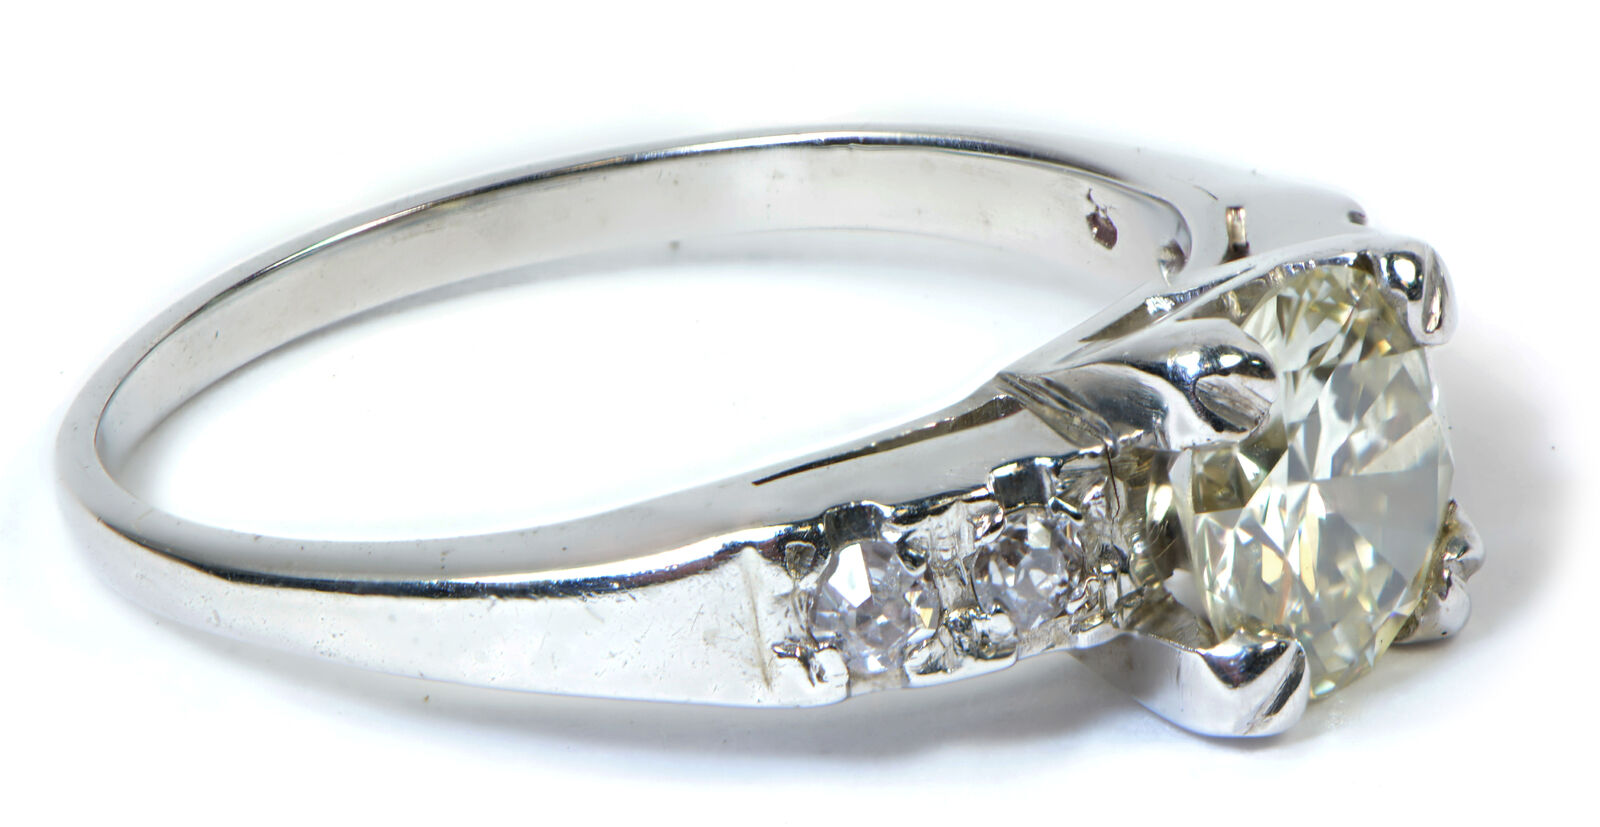 Vintage Early Round Diamond Engagement Ring 18k White Gold Tns Diamonds Philadelphia